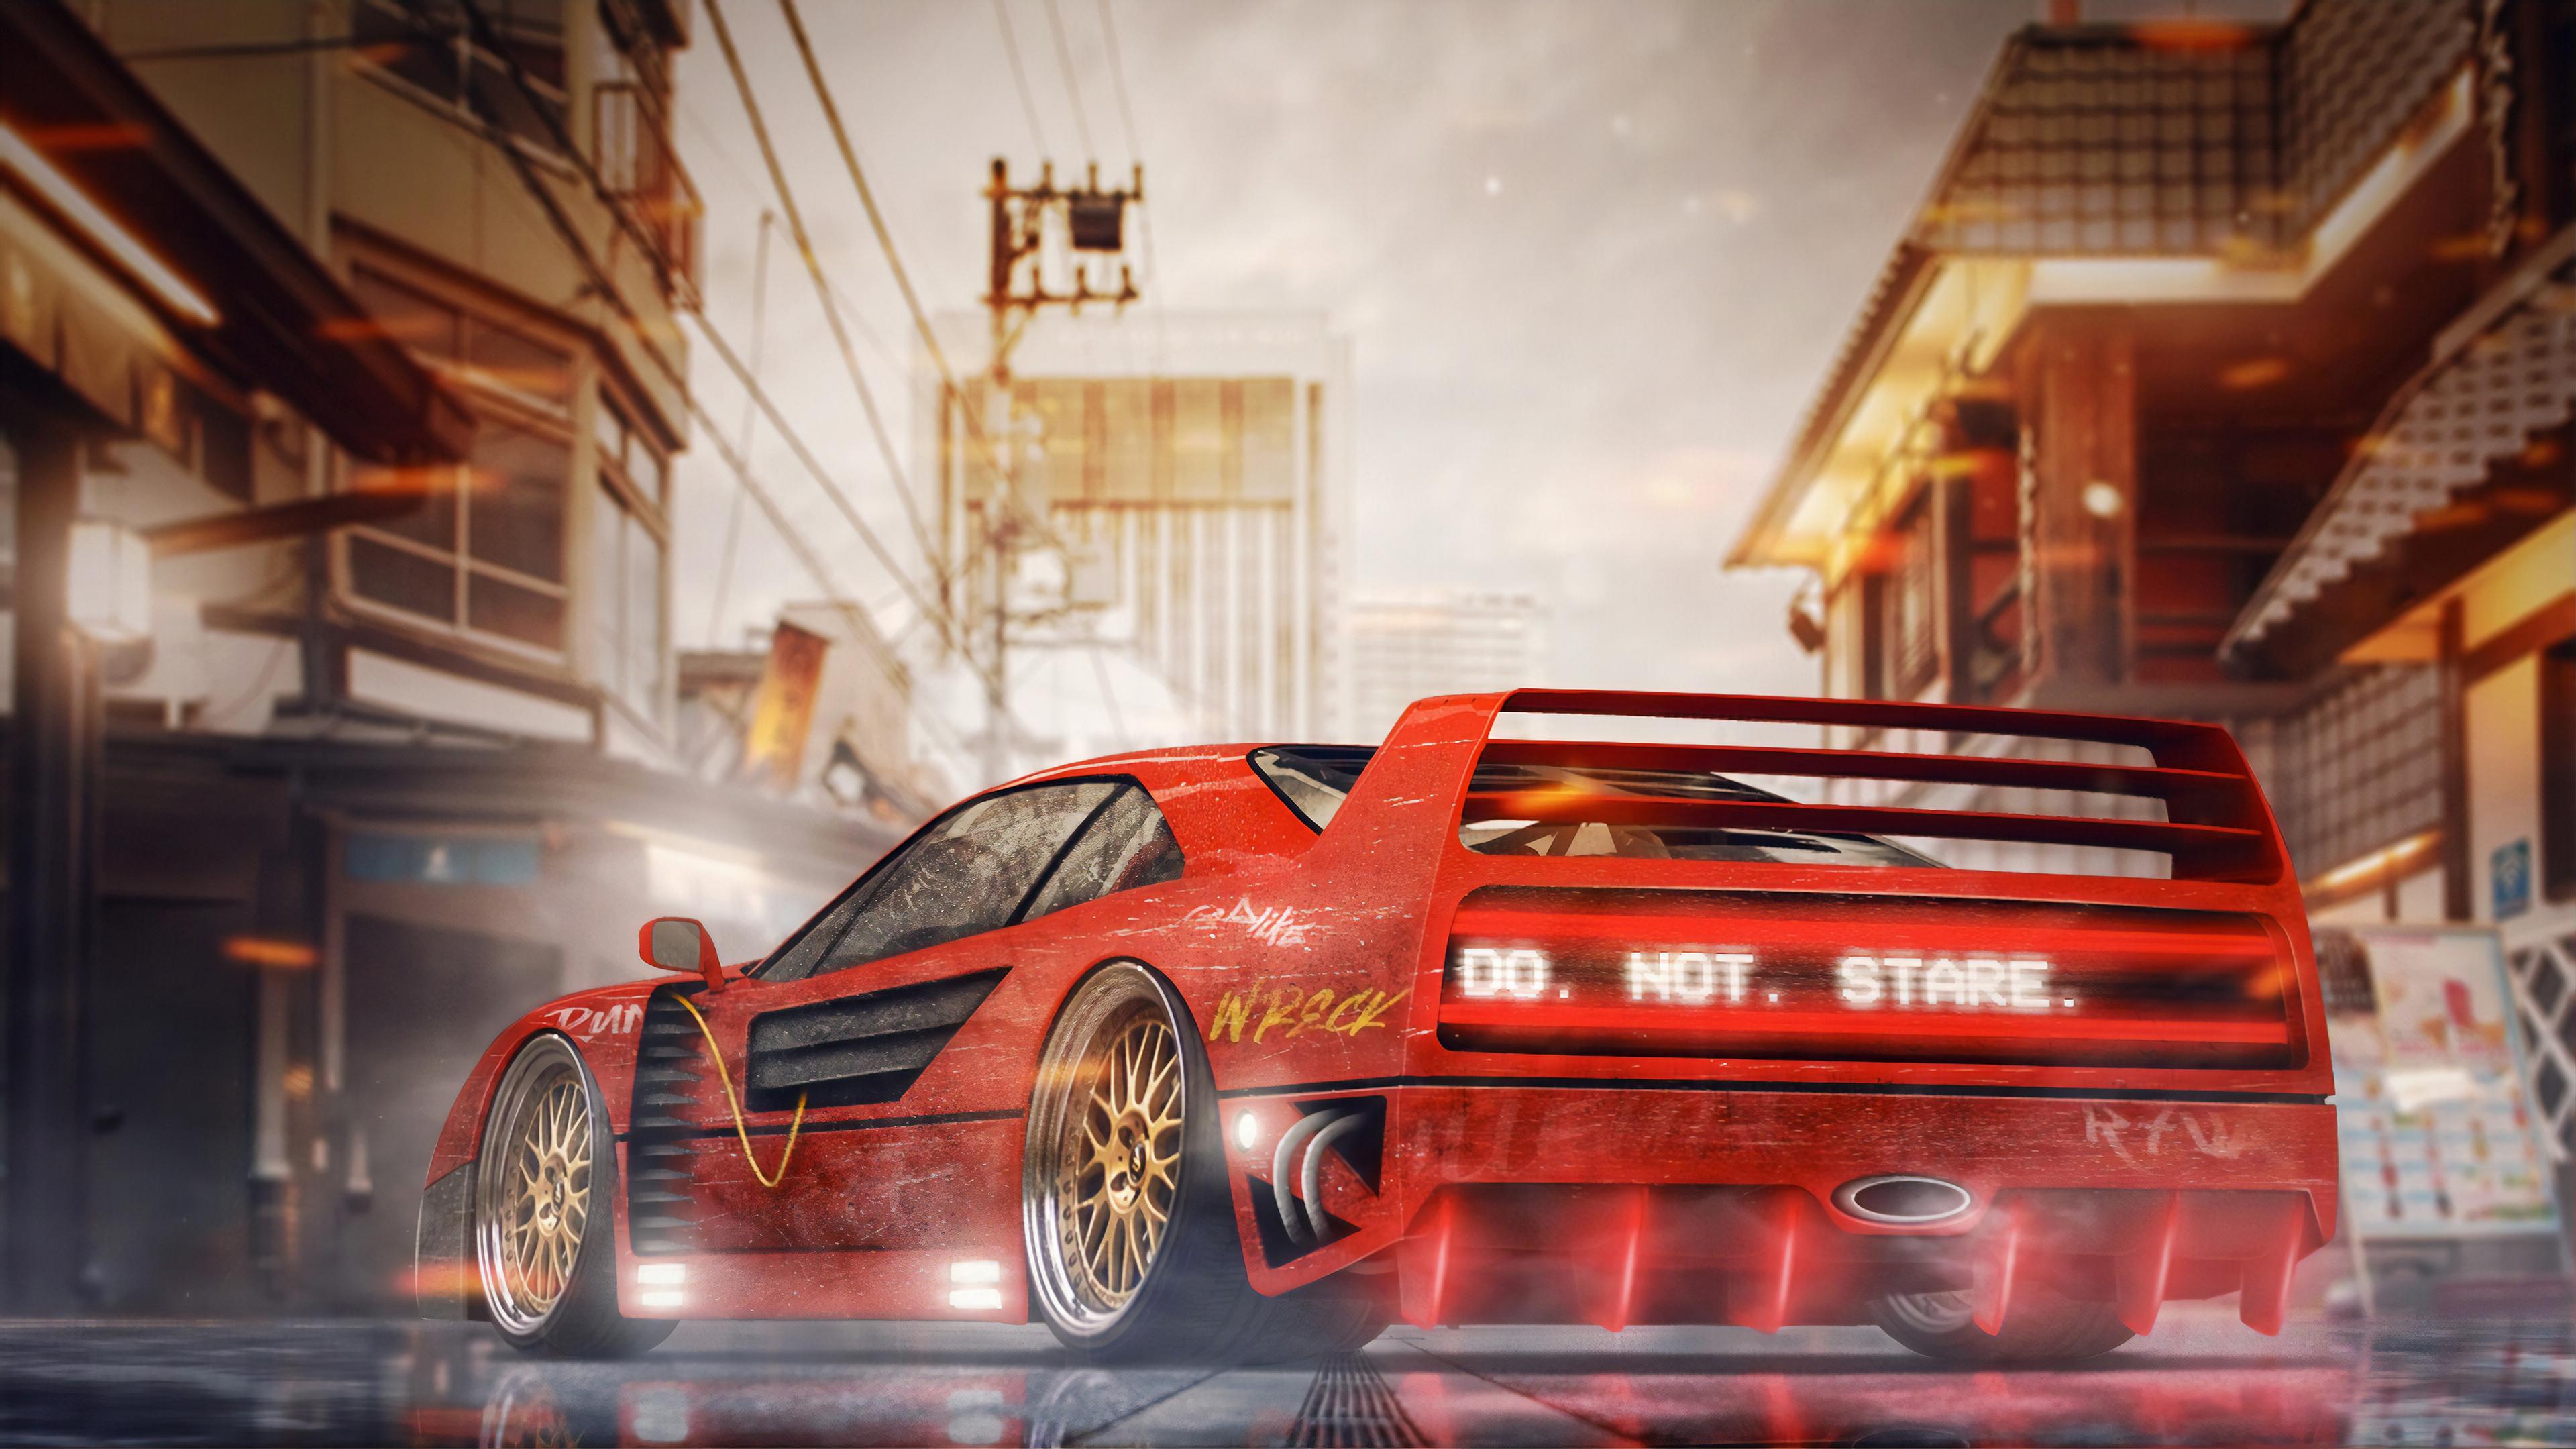 Ferrari F40 Digital Art 4k, HD Cars, 4k Wallpapers, Images